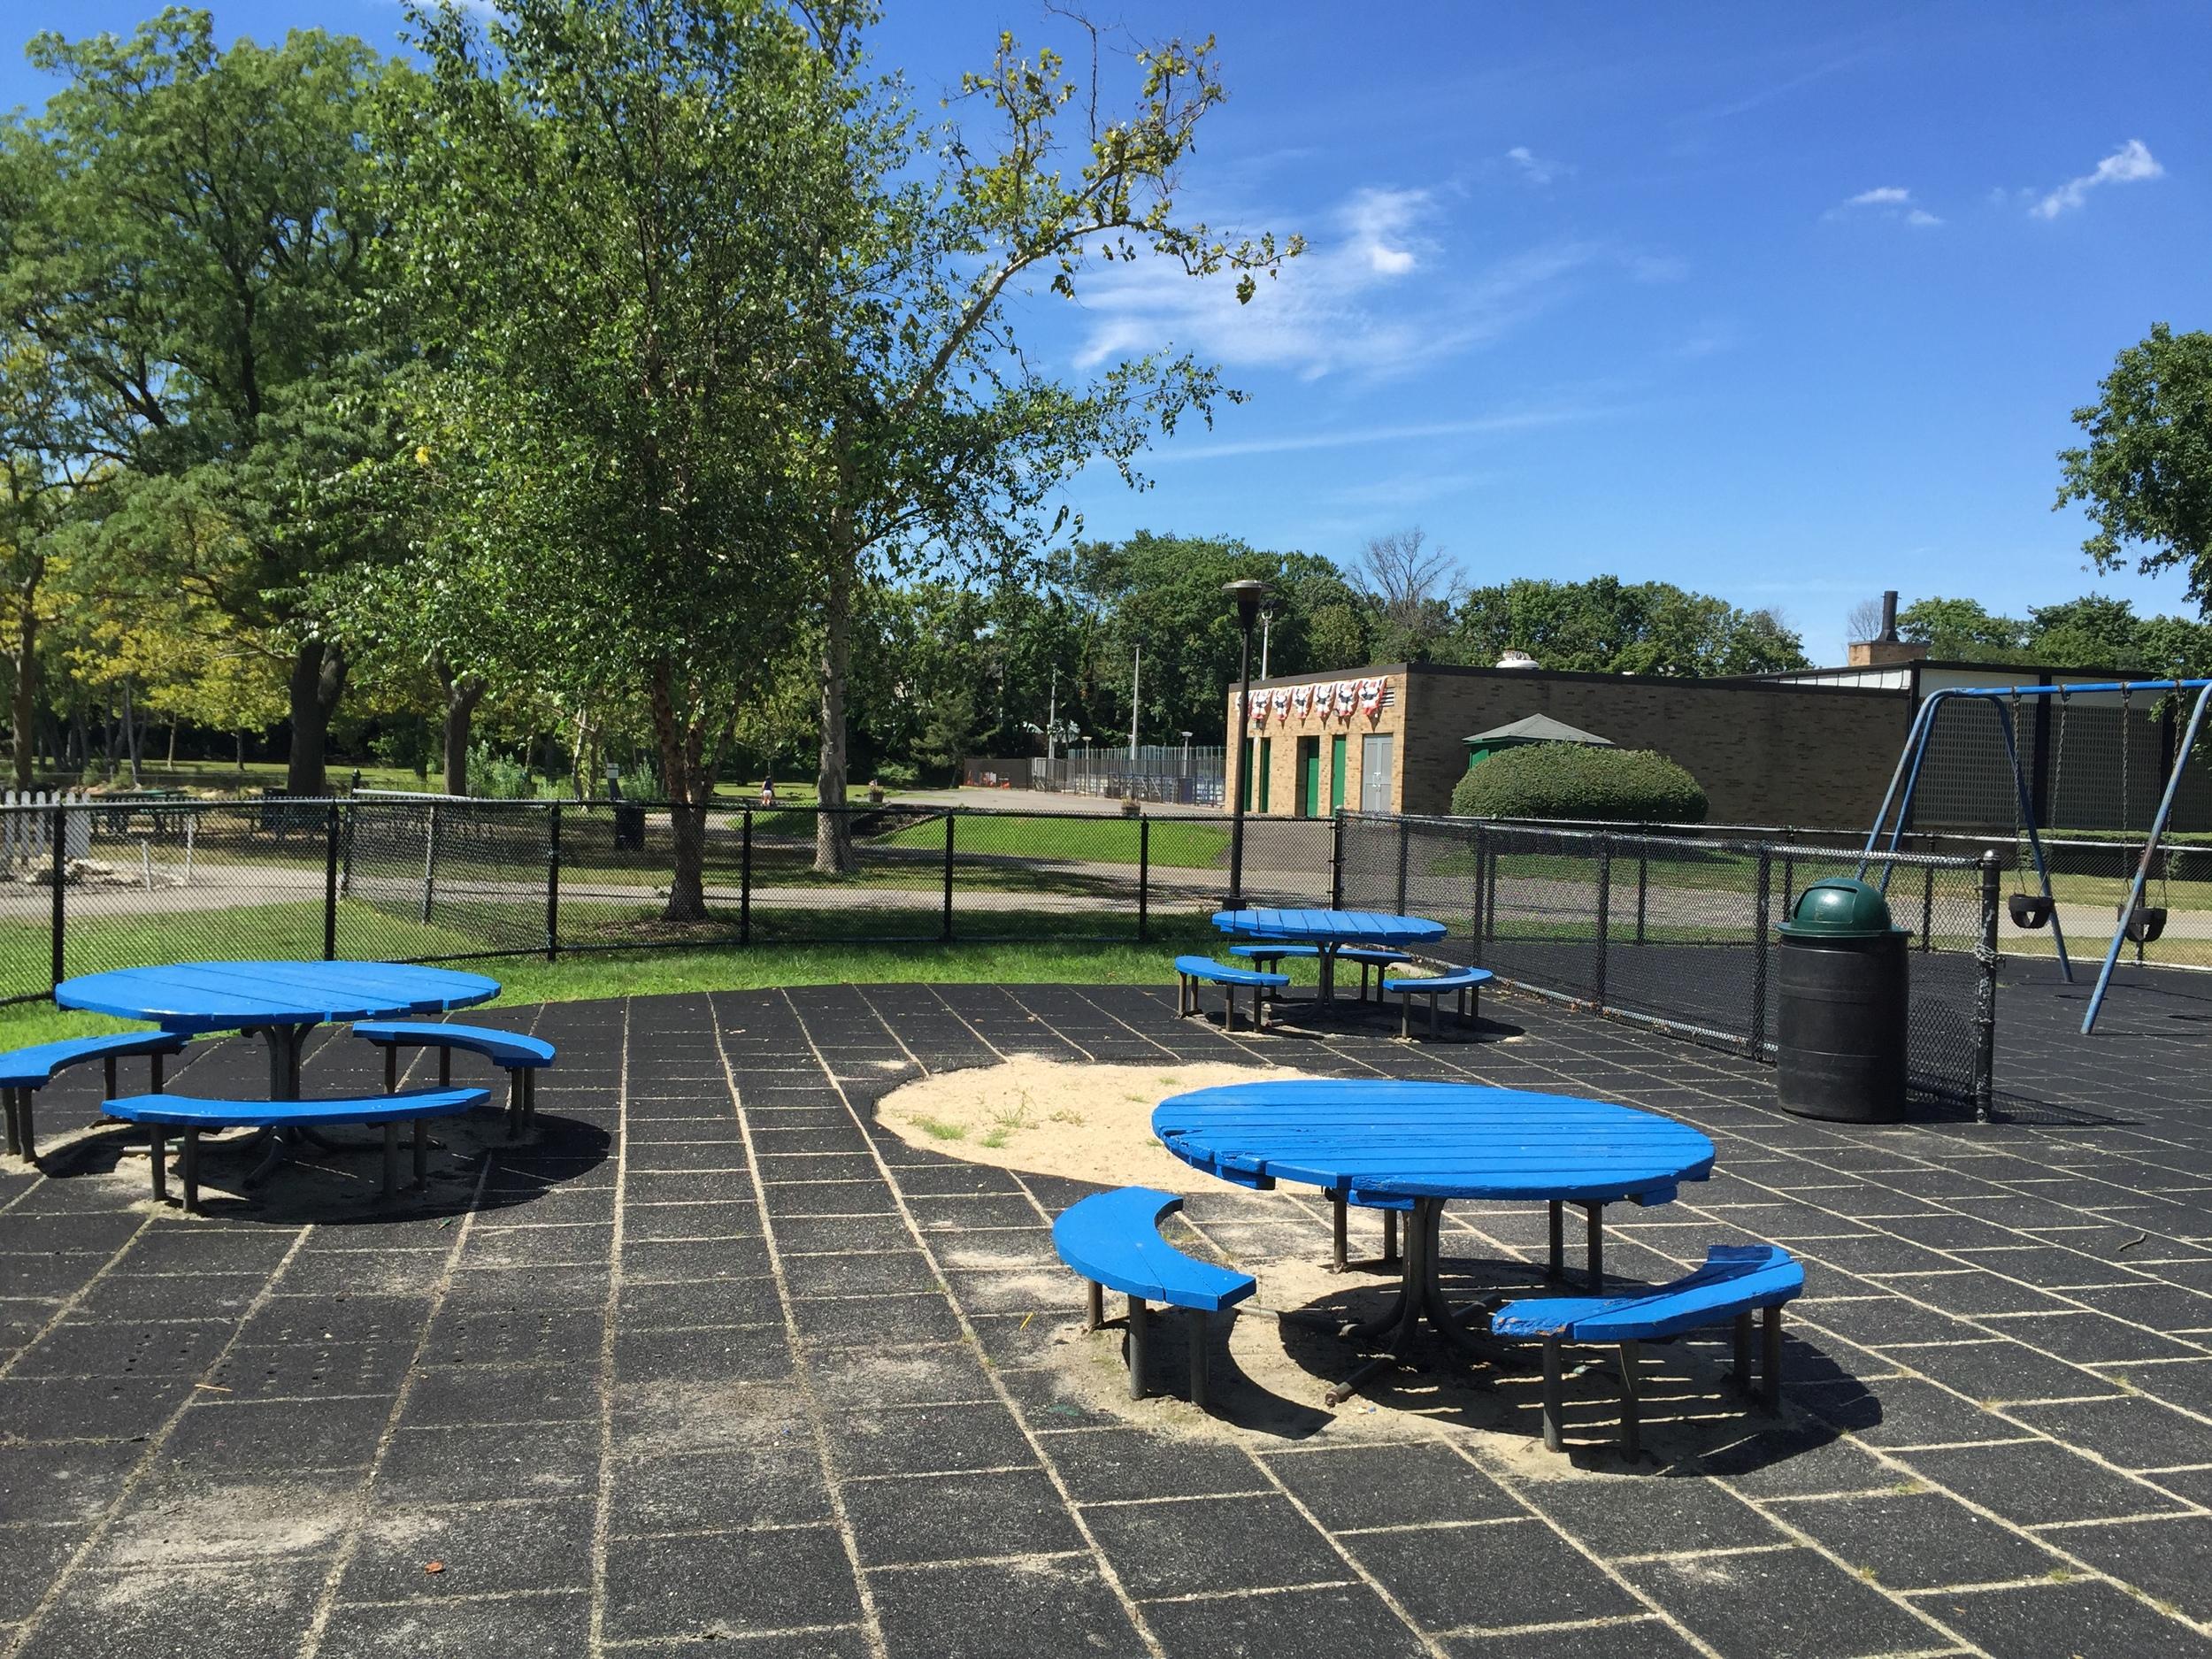 Tables at Grant Park